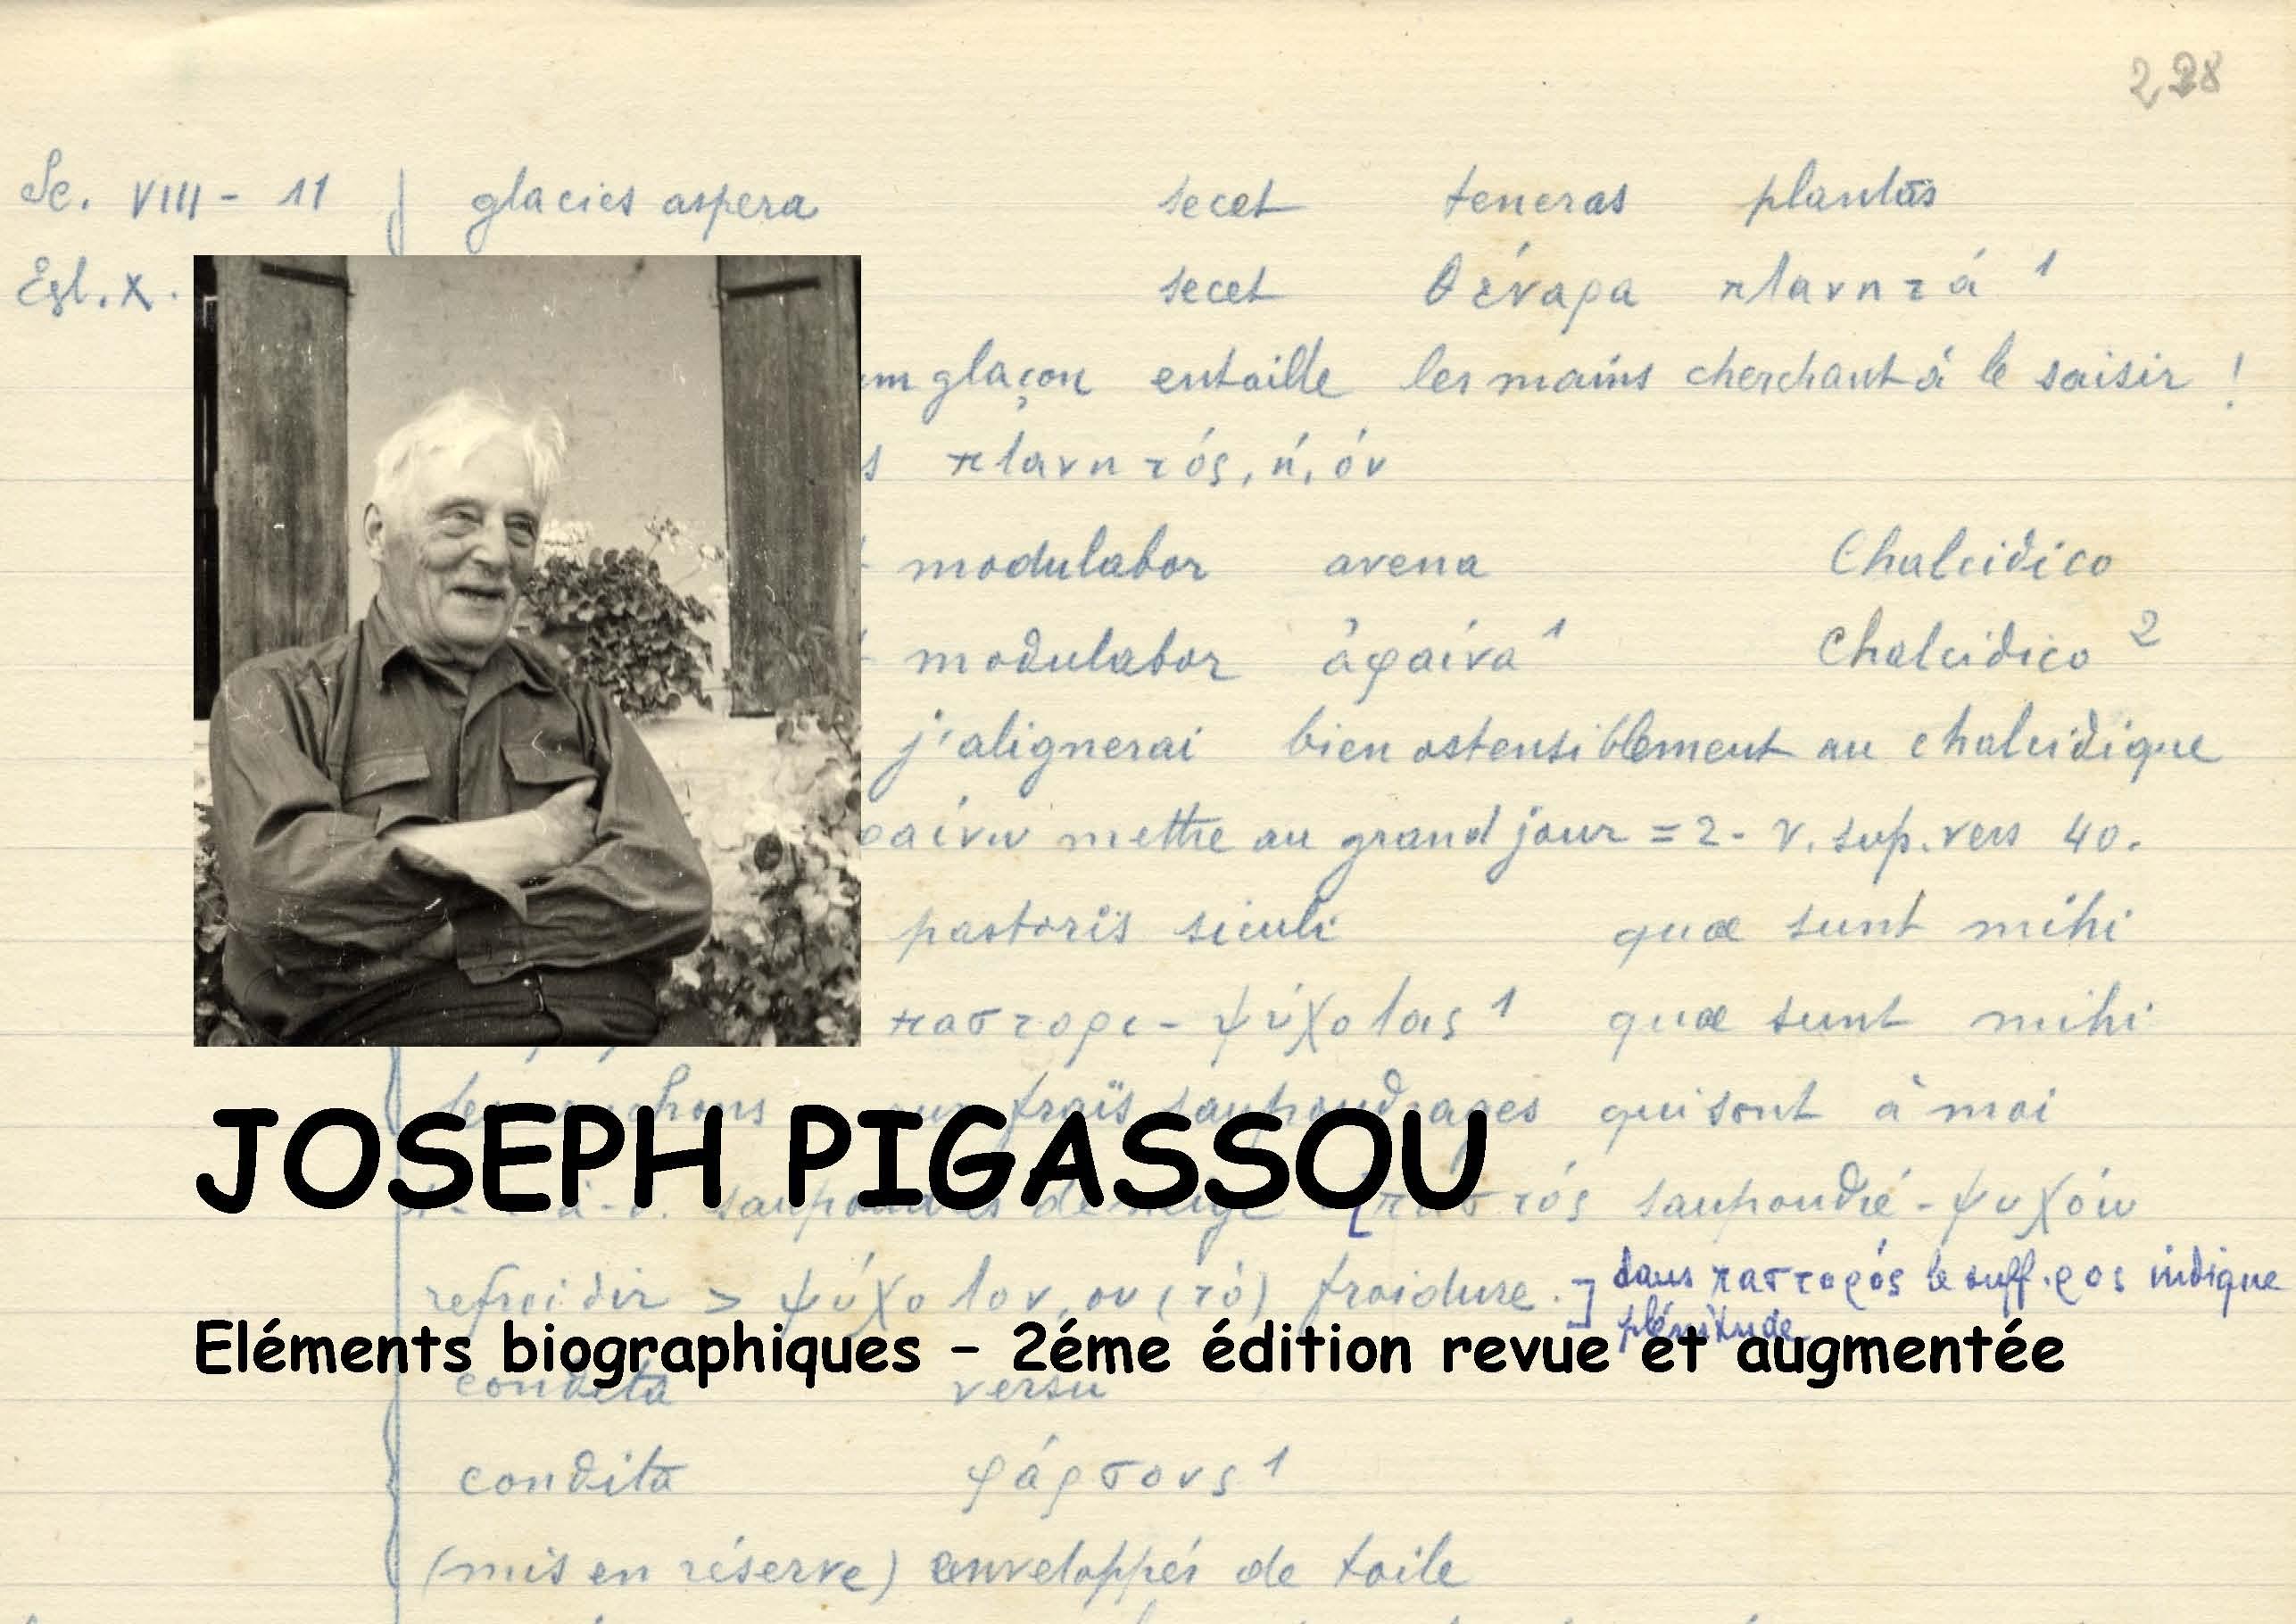 BIOGRAPHIE JOSEPH PIGASSOU 1.jpg